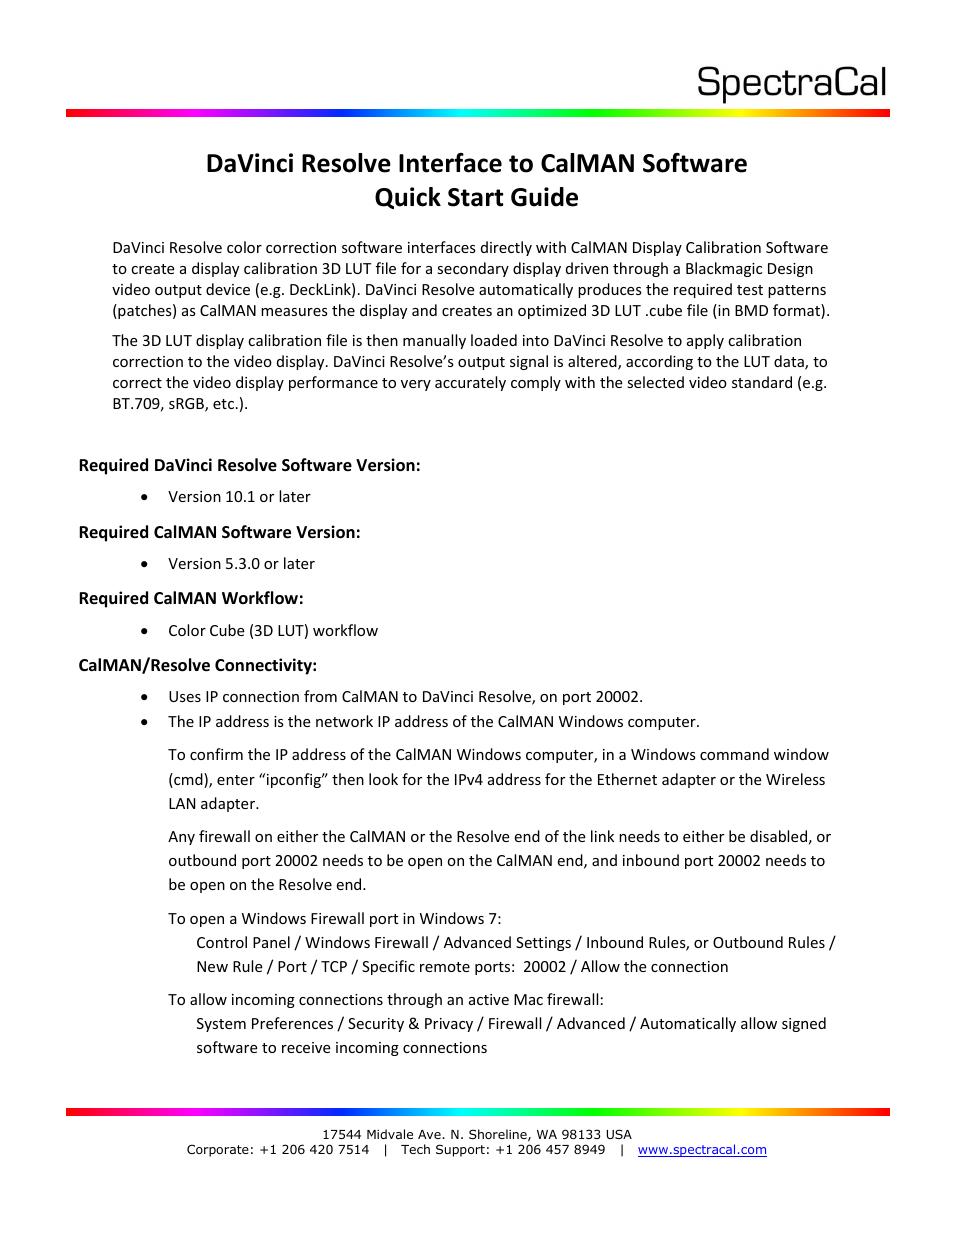 SpectraCal Blackmagic Design DaVinci Resolve User Manual